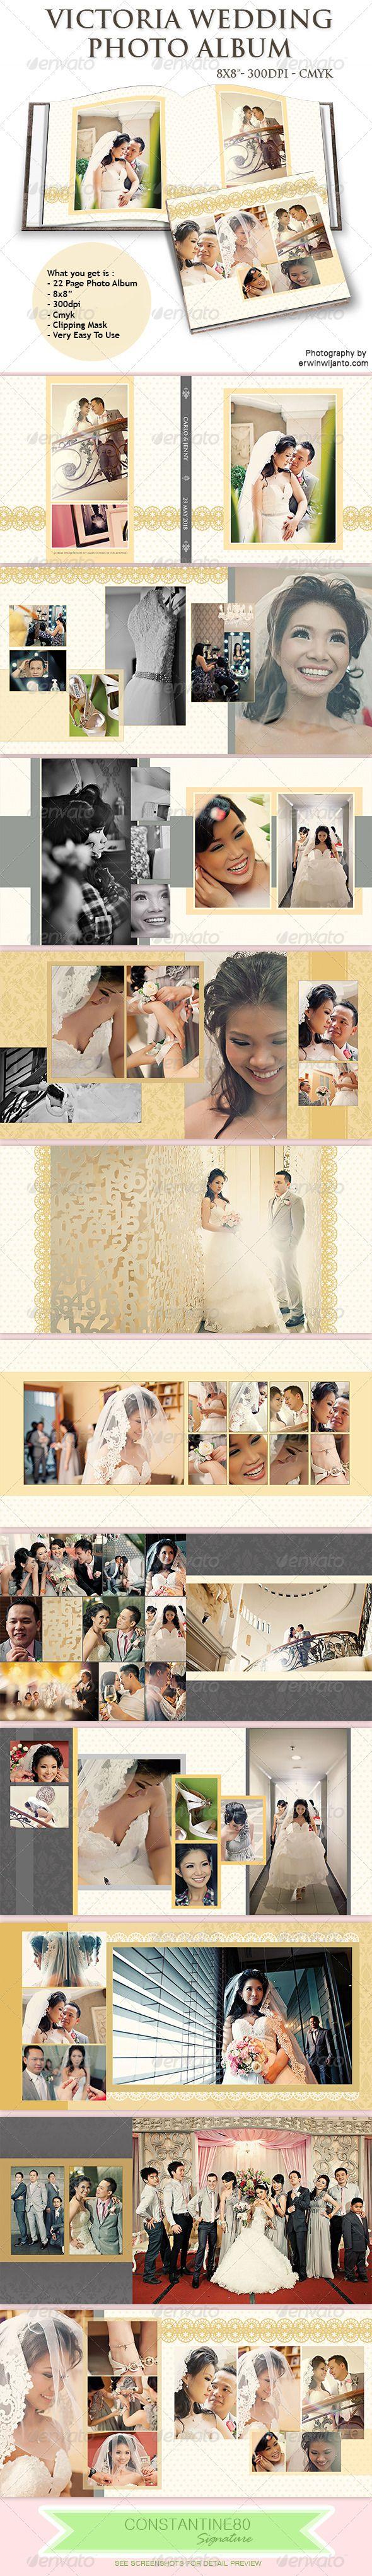 Victoria Wedding Photo Album — Photoshop PSD #photography #album • Available here → https://graphicriver.net/item/victoria-wedding-photo-album/5242113?ref=pxcr